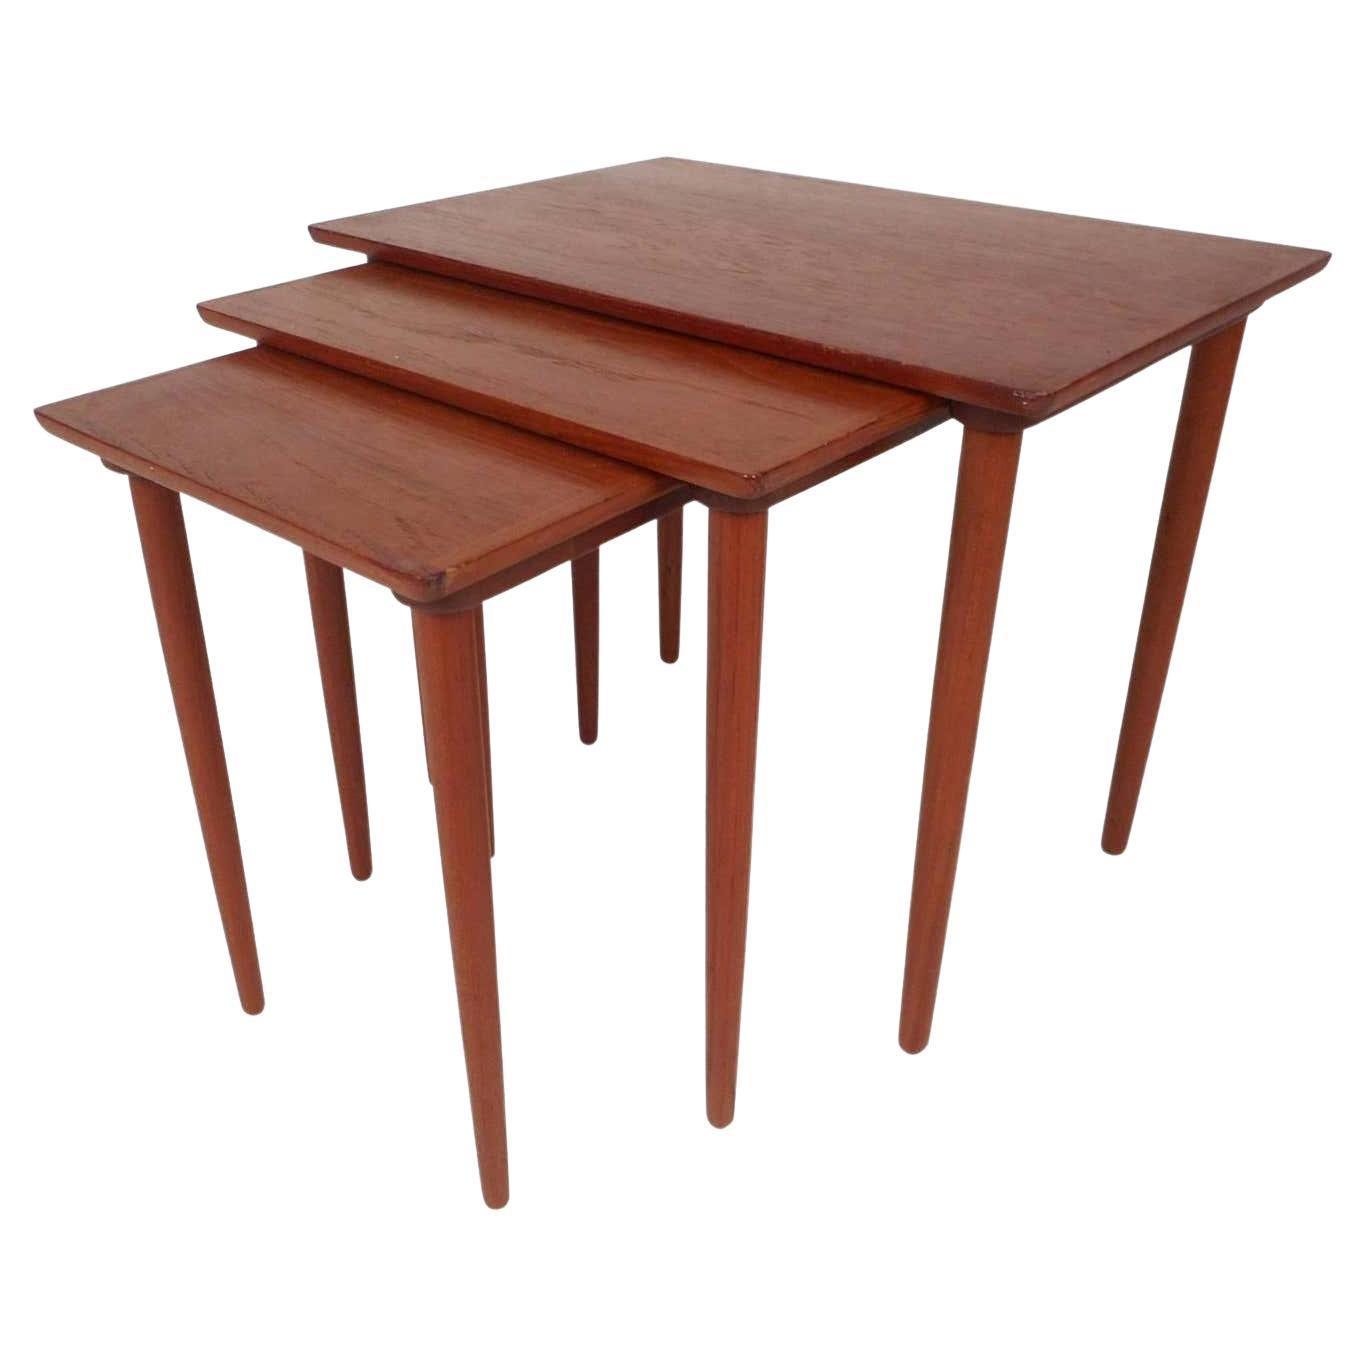 Set of Three Mid-Century Modern Teak Nesting Tables by Bramin Mobler